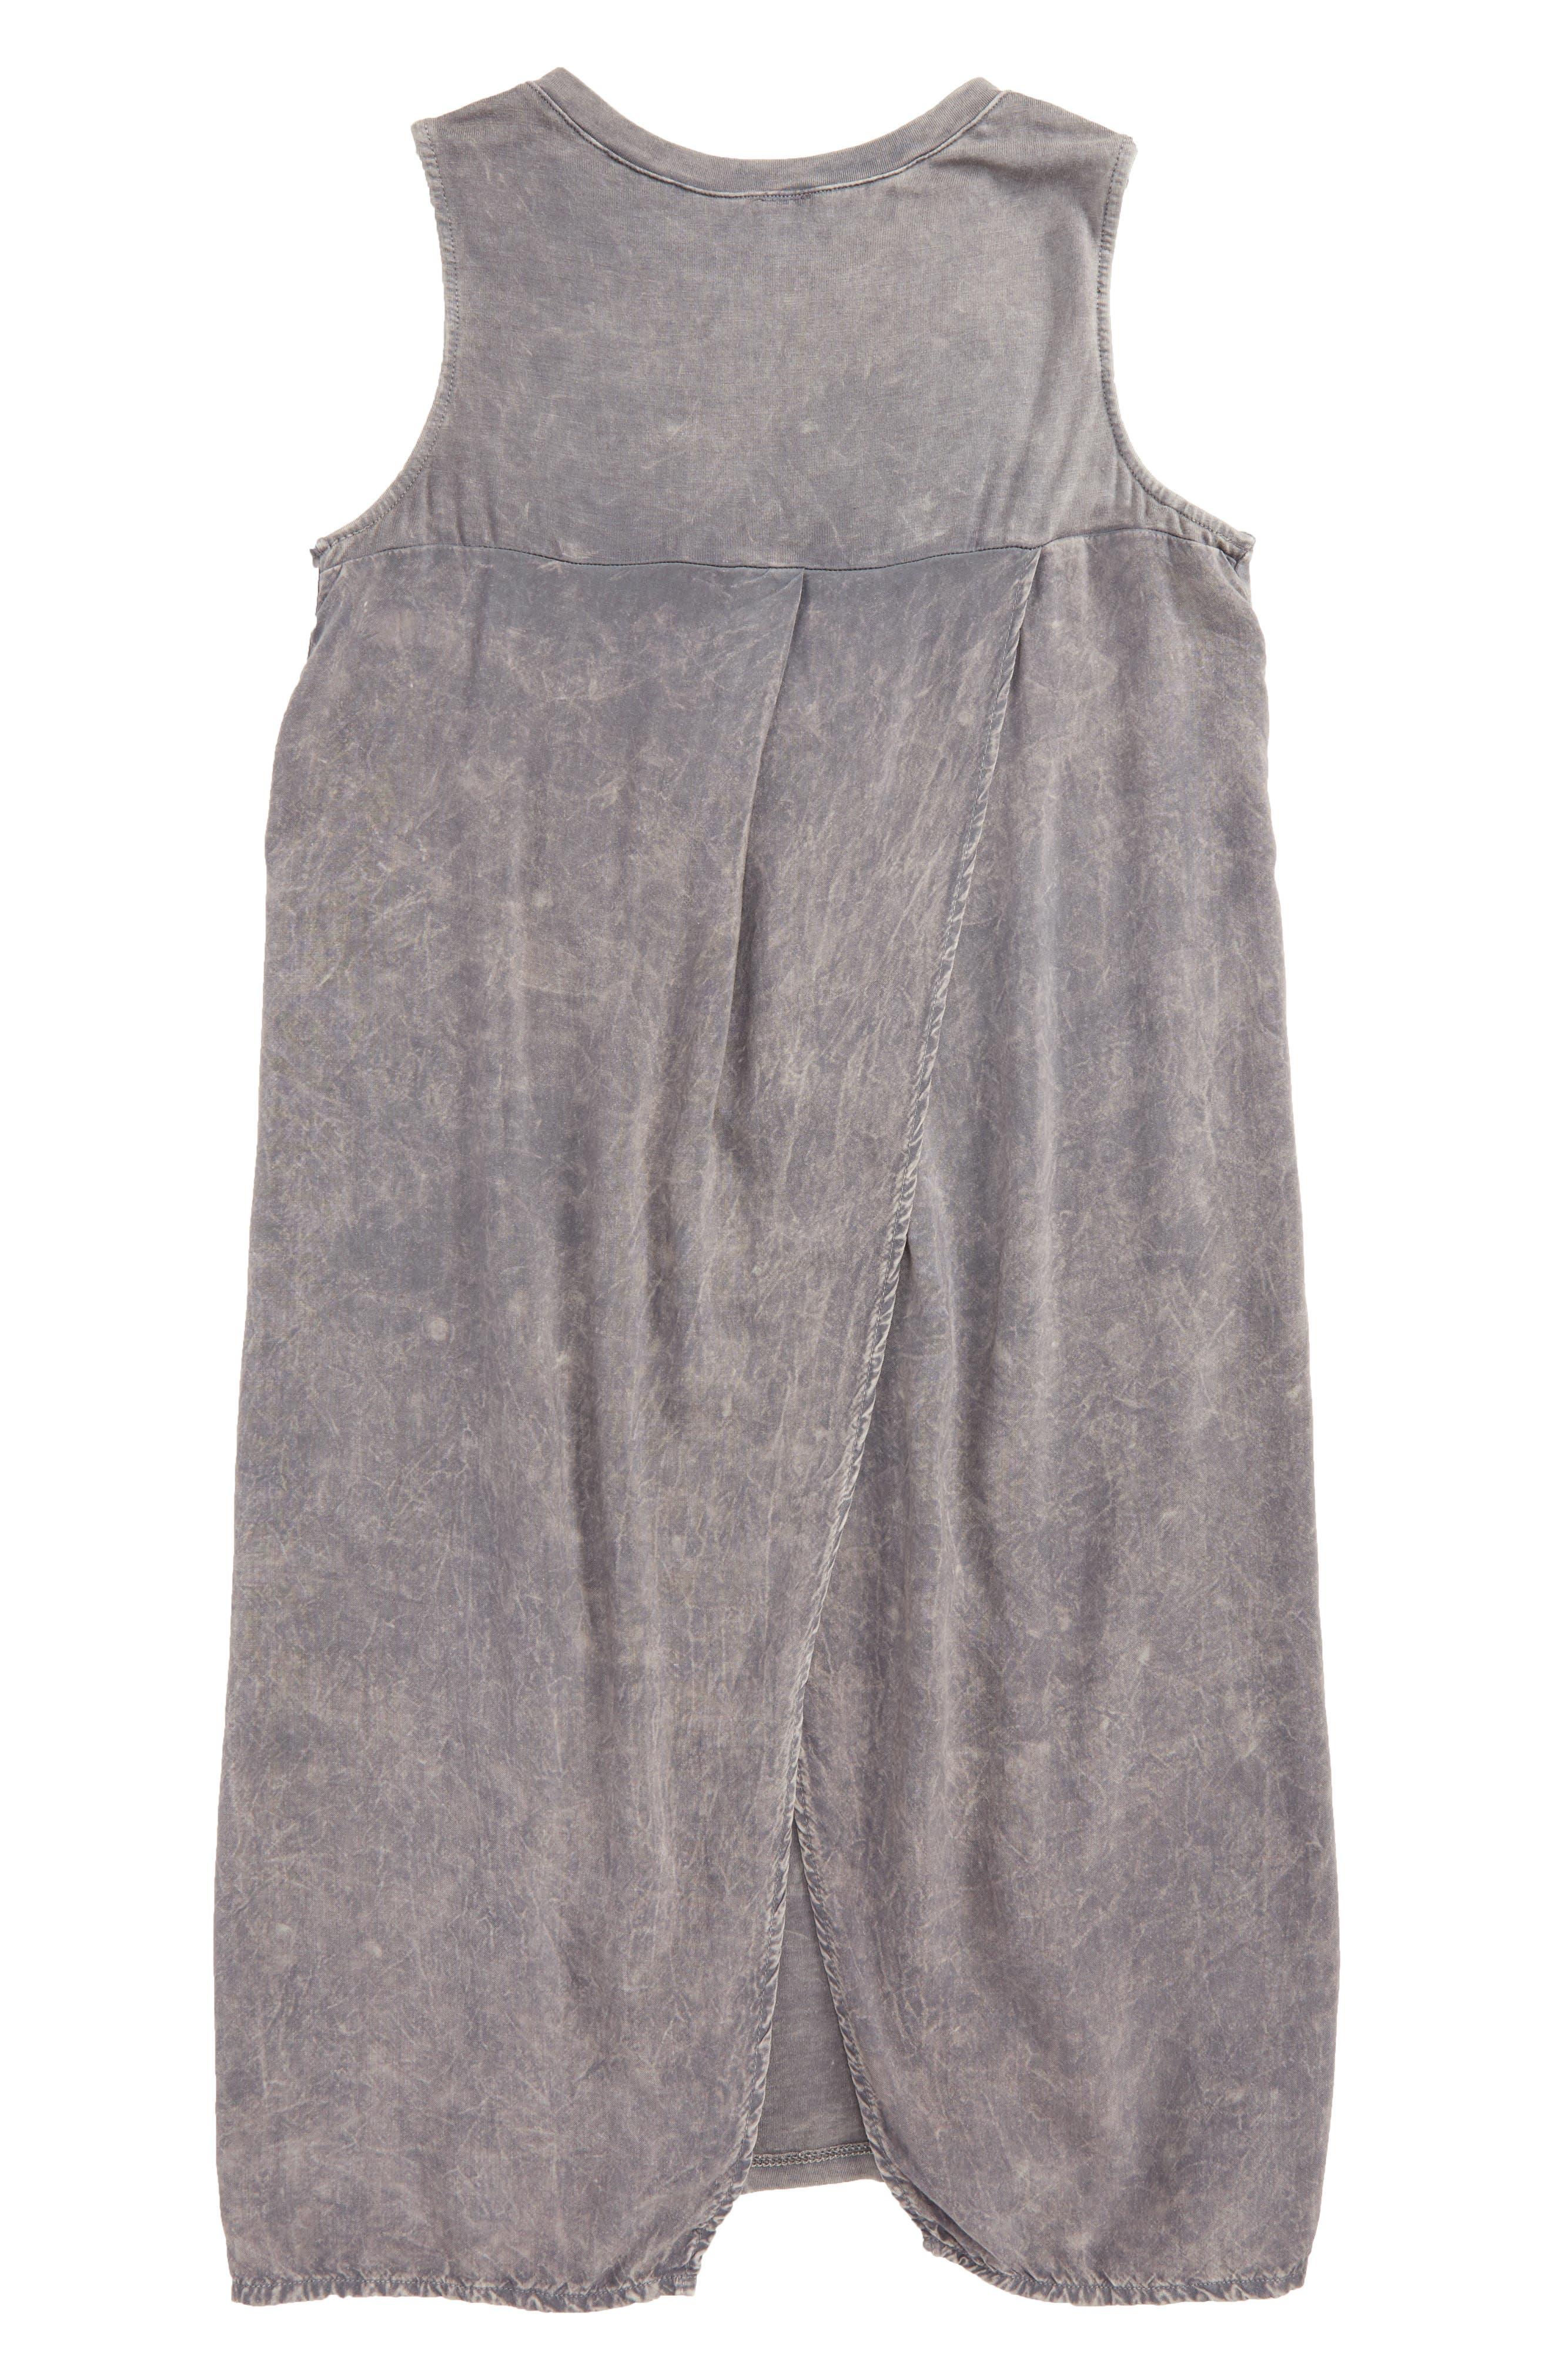 Mineral Wash Sleeveless Tunic,                             Alternate thumbnail 2, color,                             Charcoal